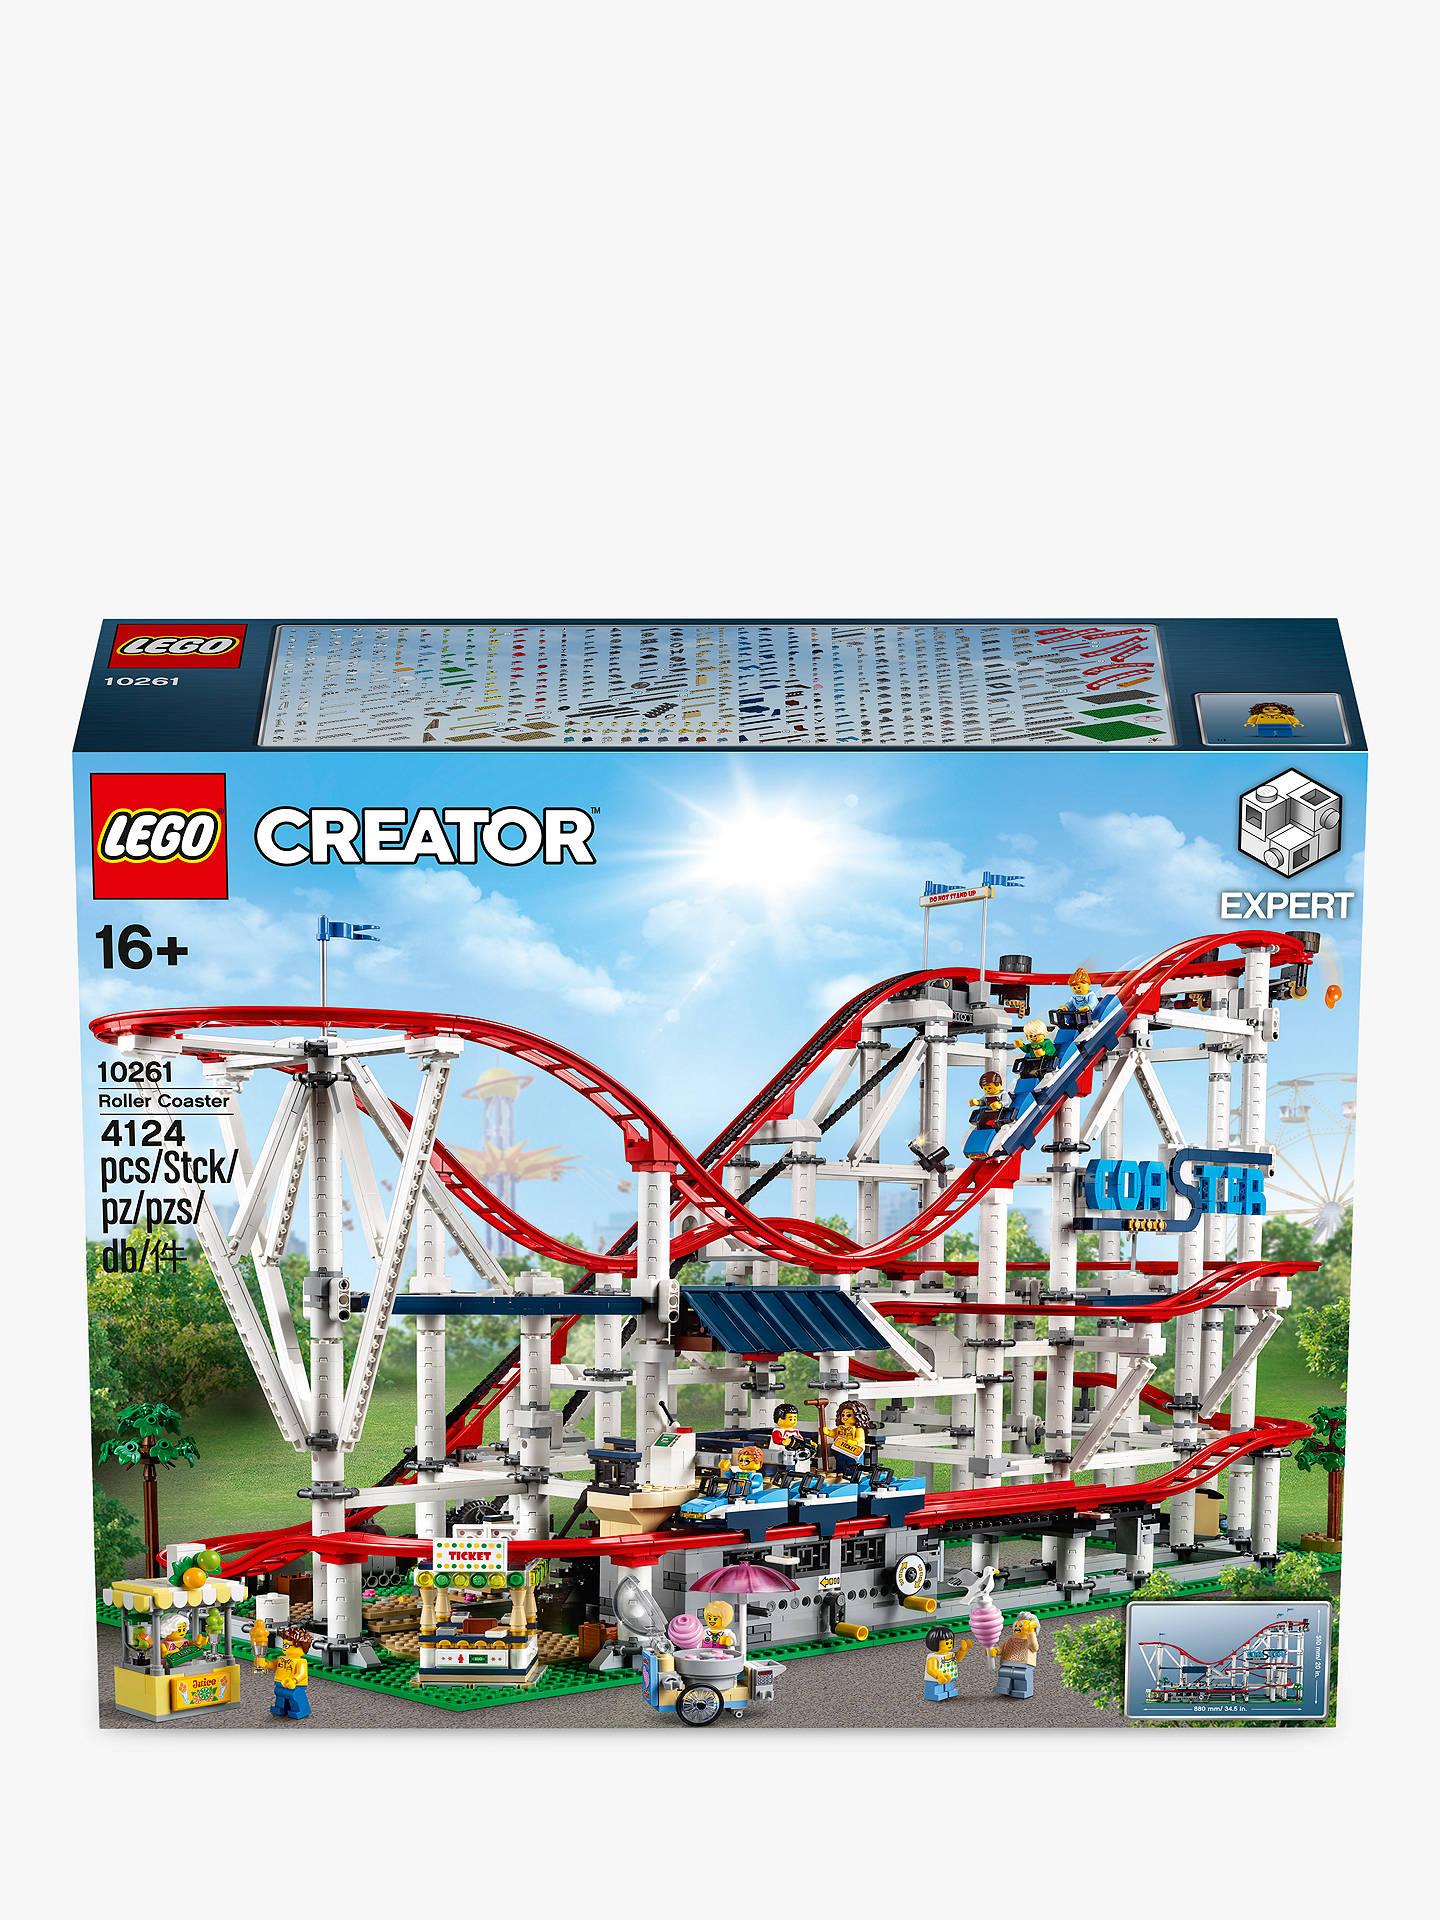 Lego 10261 Creator Expert Roller Coaster - £224 @ John Lewis